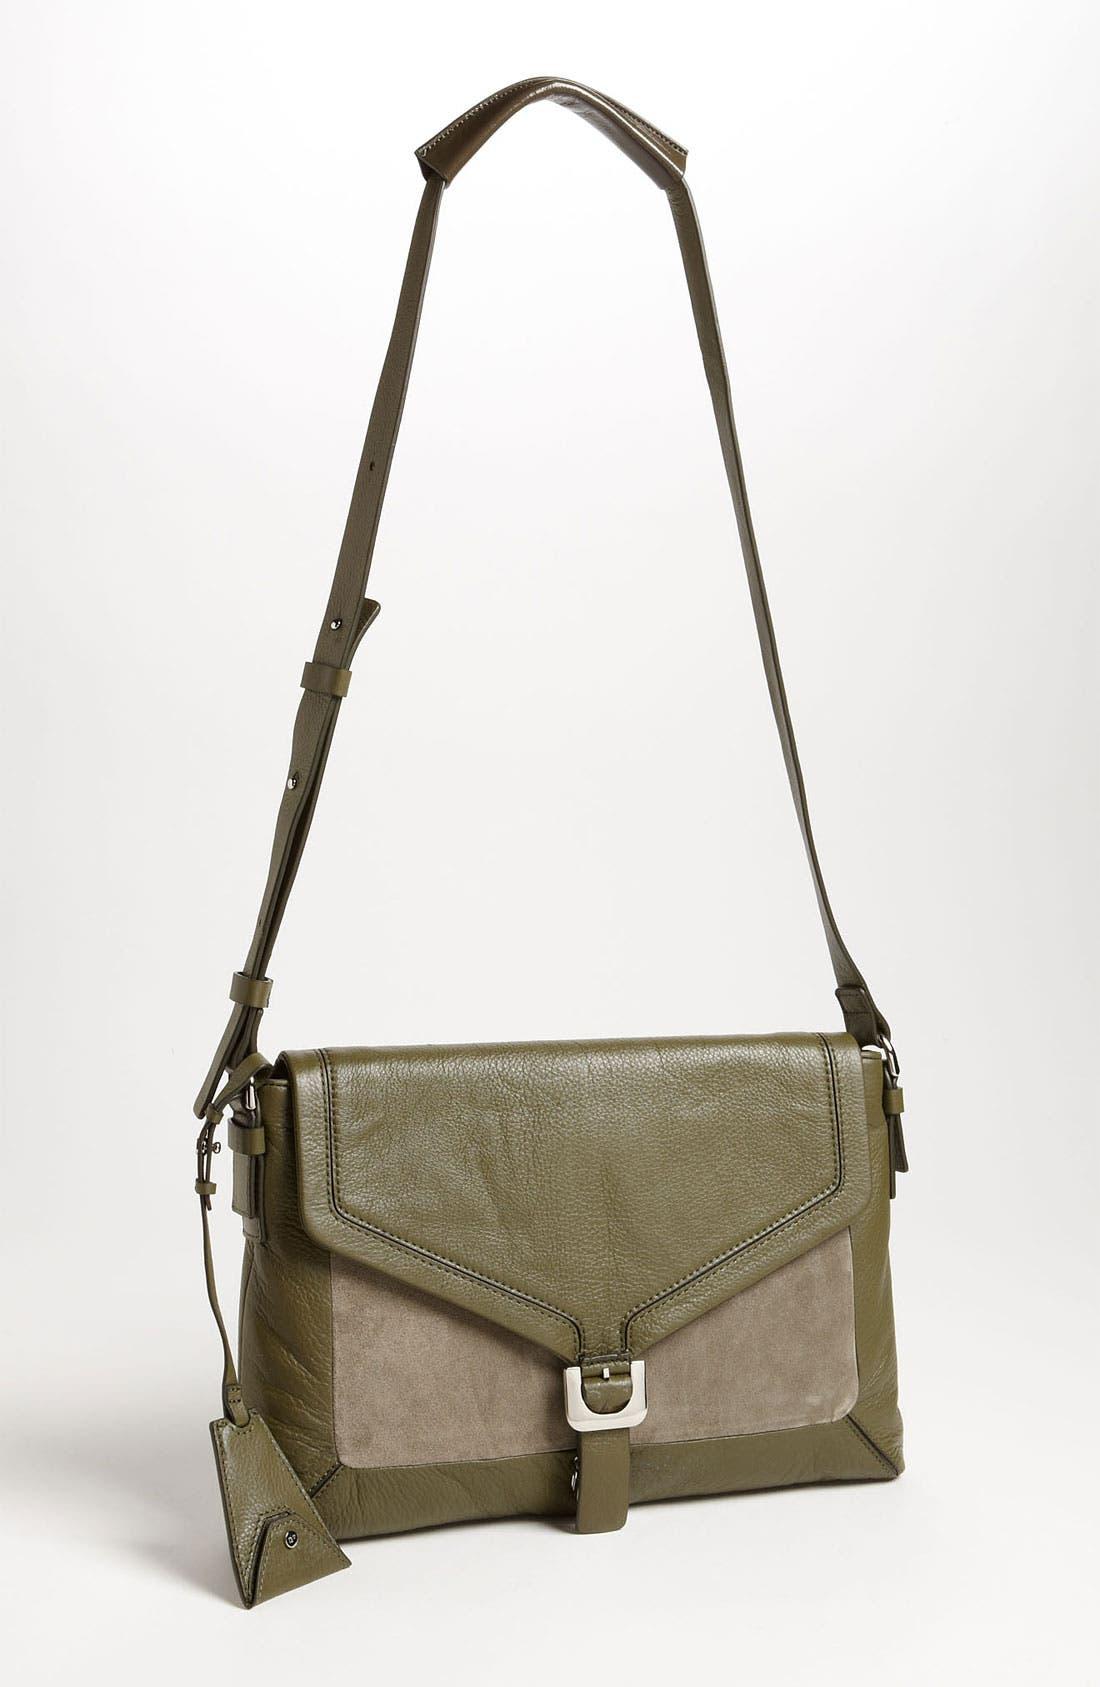 Main Image - Diane von Furstenberg 'Drew - Connect' Leather Shoulder Bag